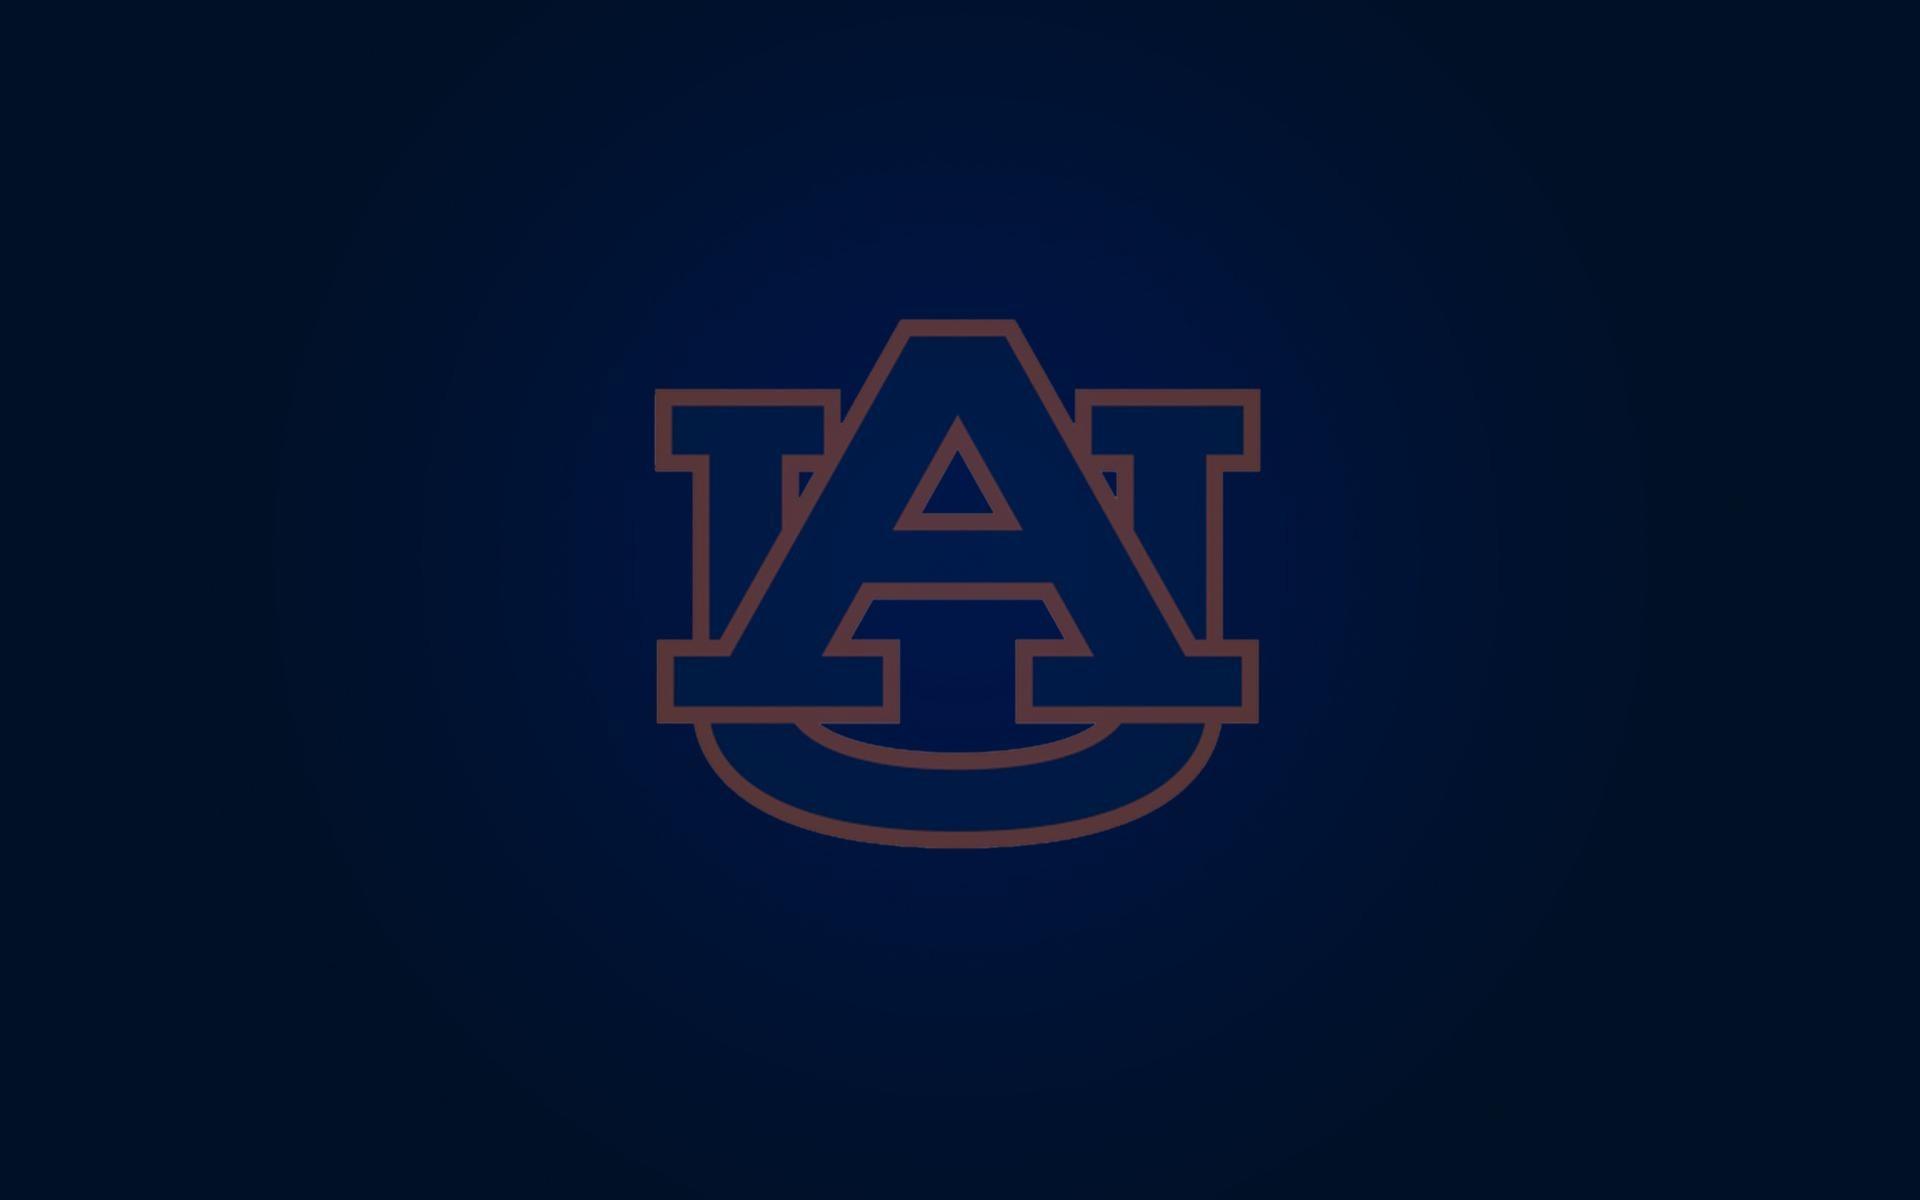 Auburn Football Screensavers And Wallpaper (69+ Images